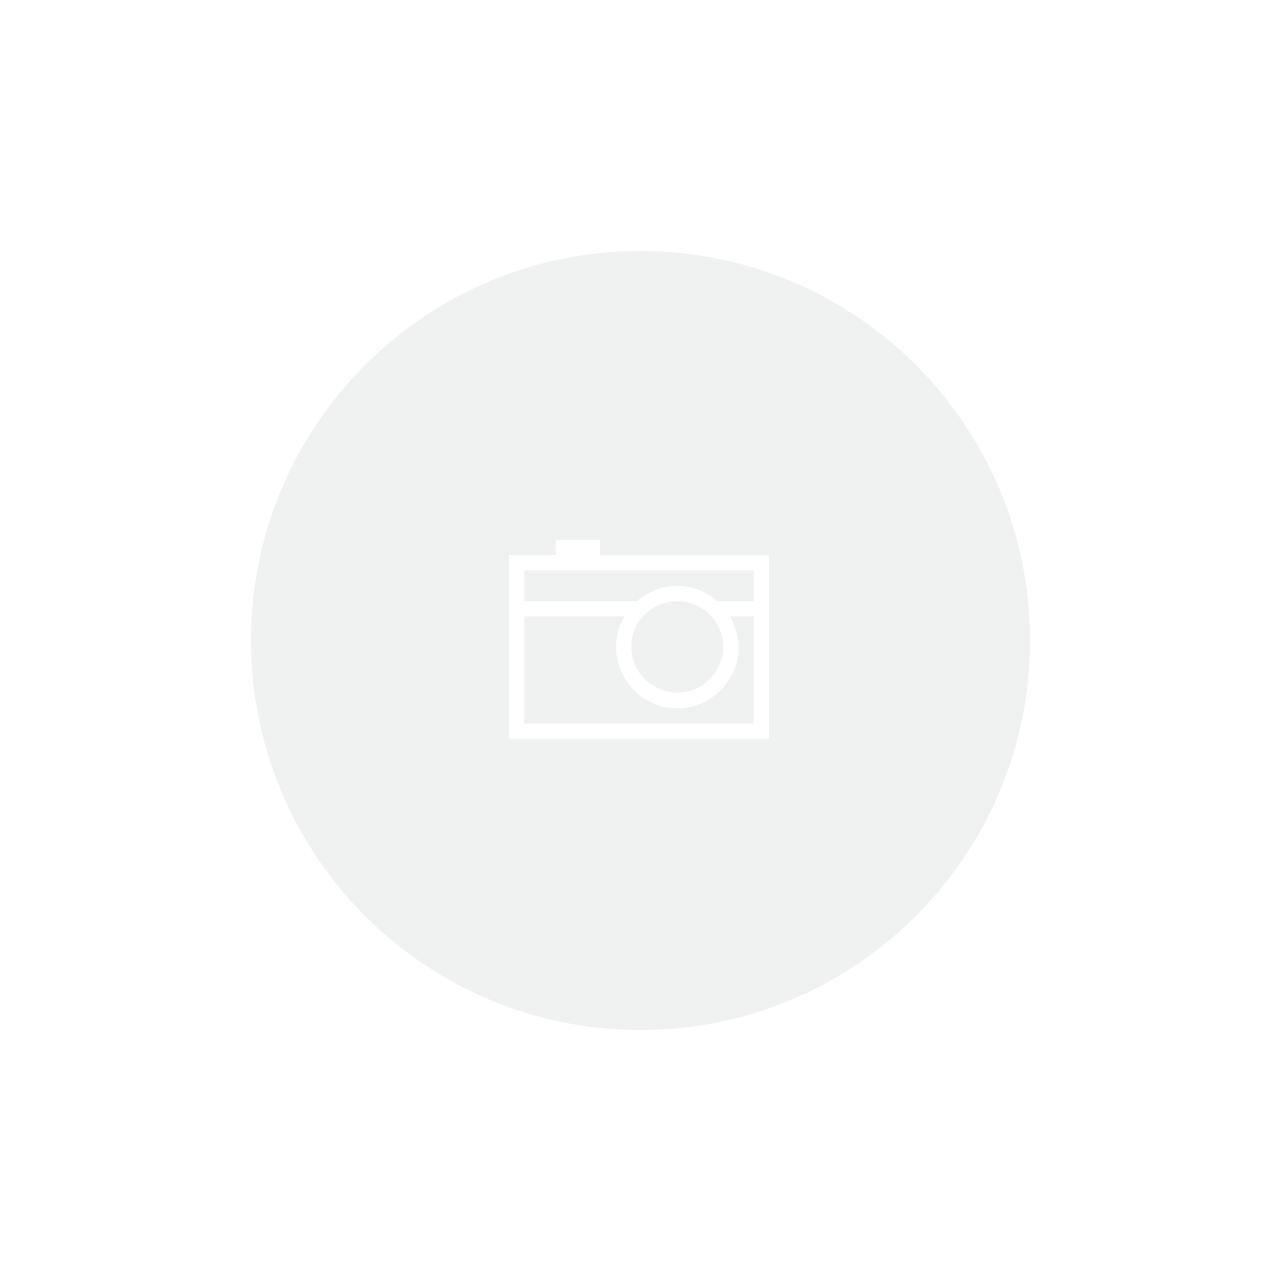 Chinelo Tecido Feminino Beeton Bali F 03